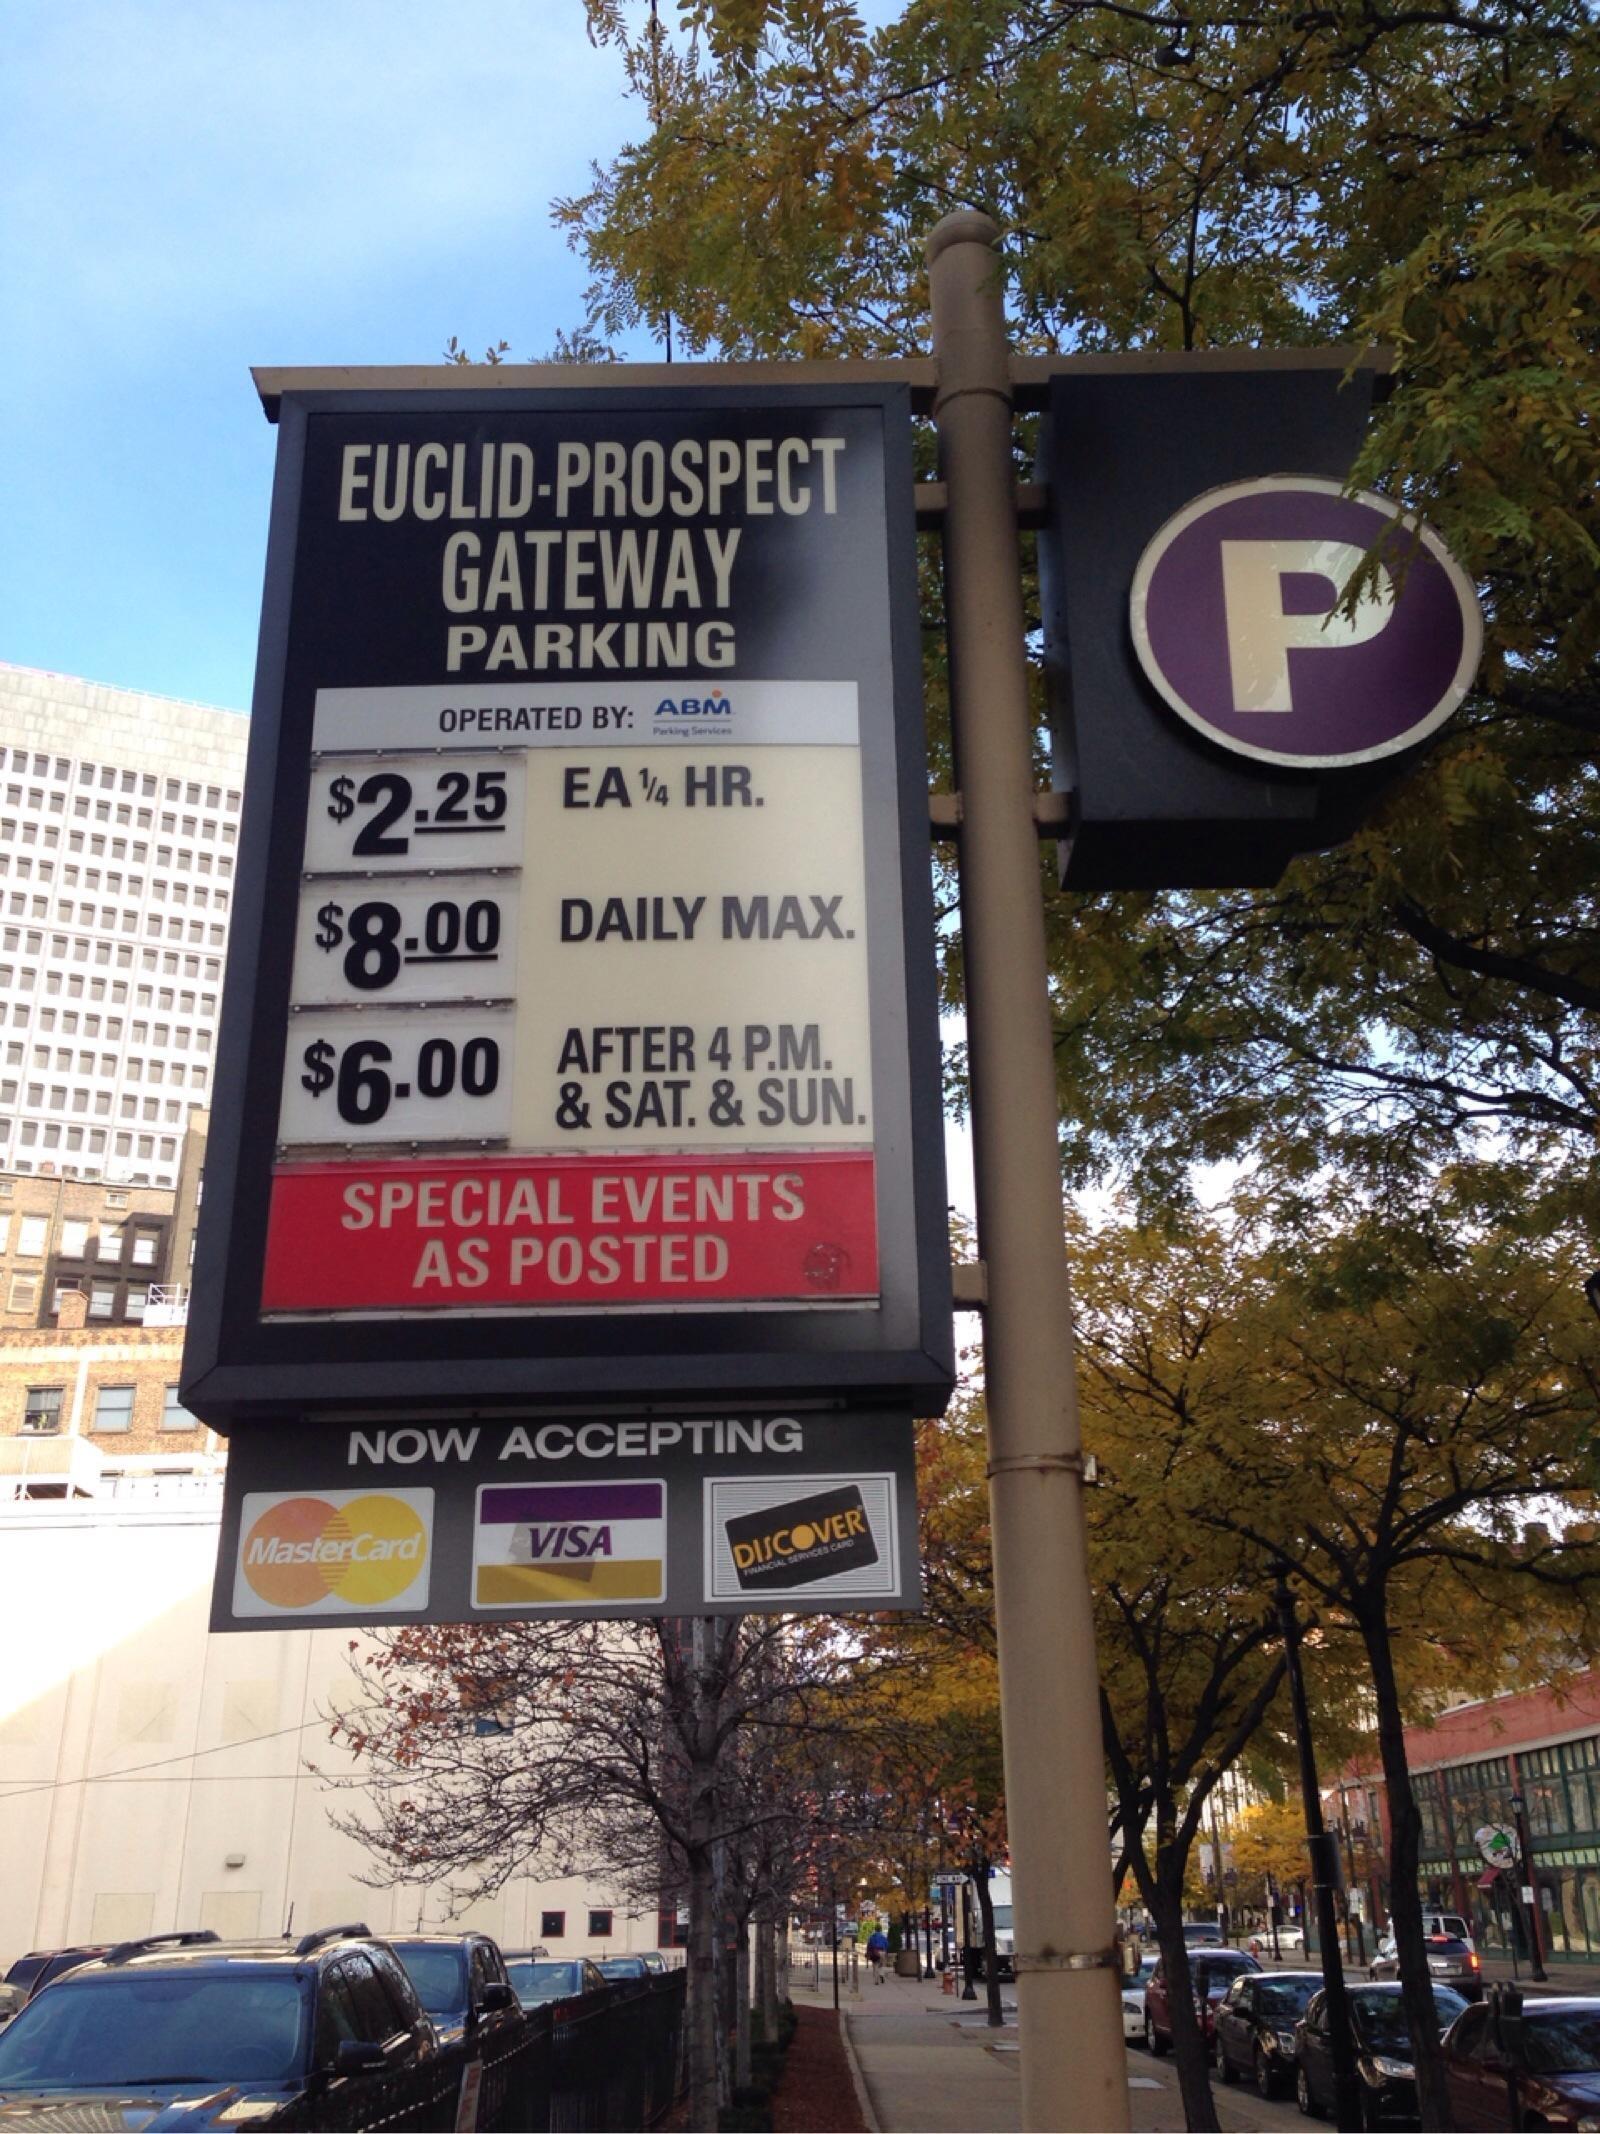 Euclid Prospect Gateway Garage Parking In Cleveland Parkme